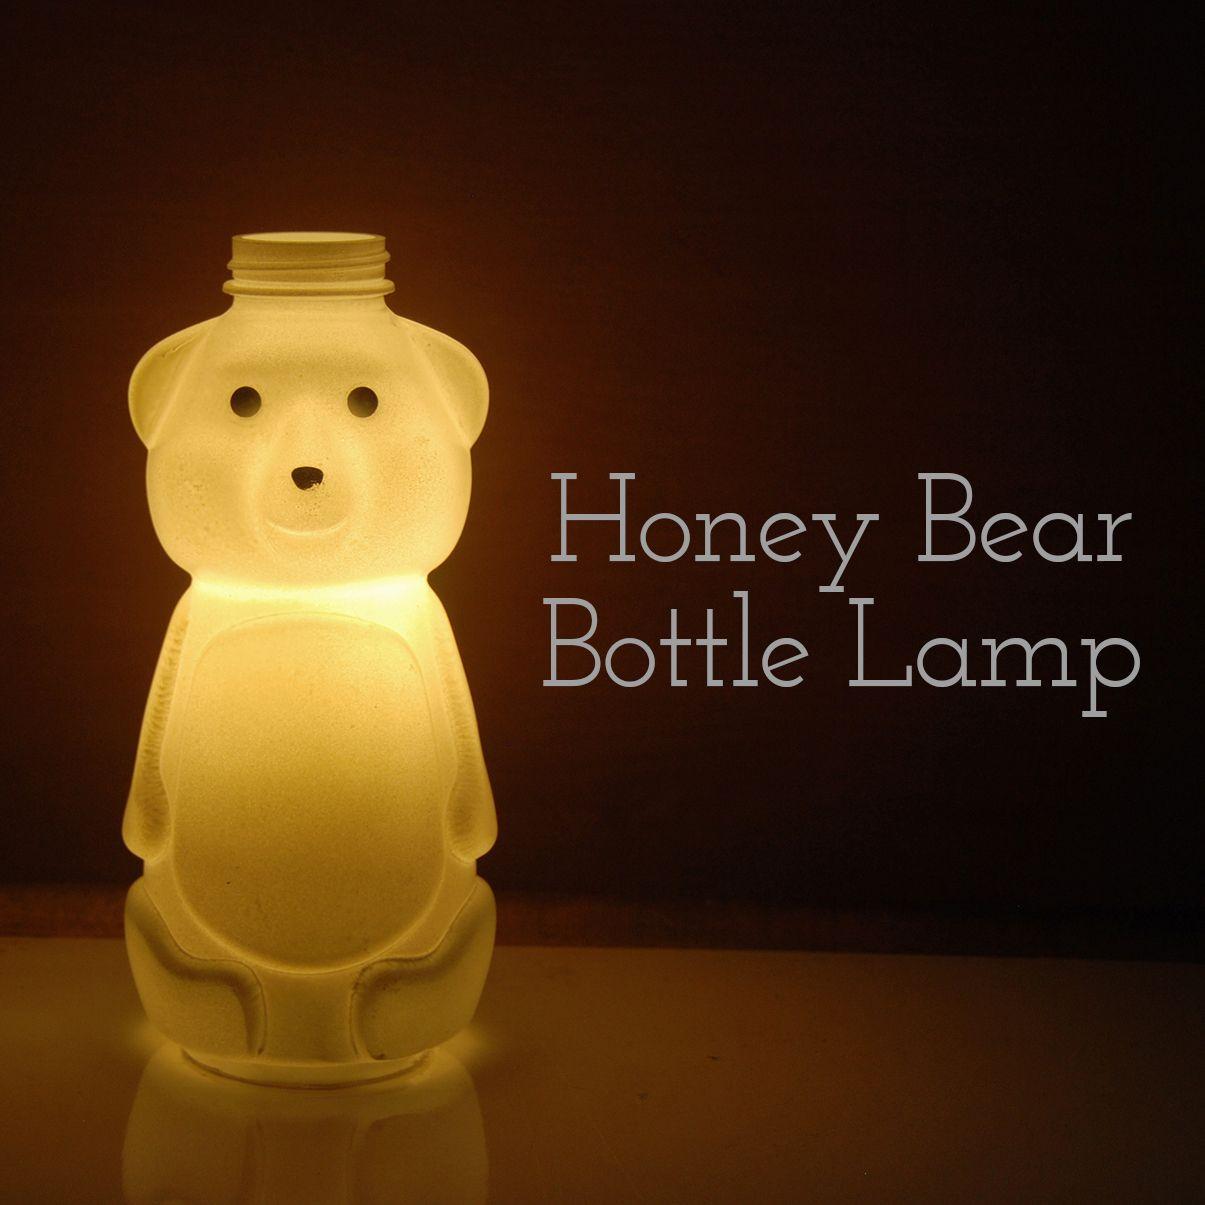 honey bear bottle lamp who knew an empty plastic bottle could